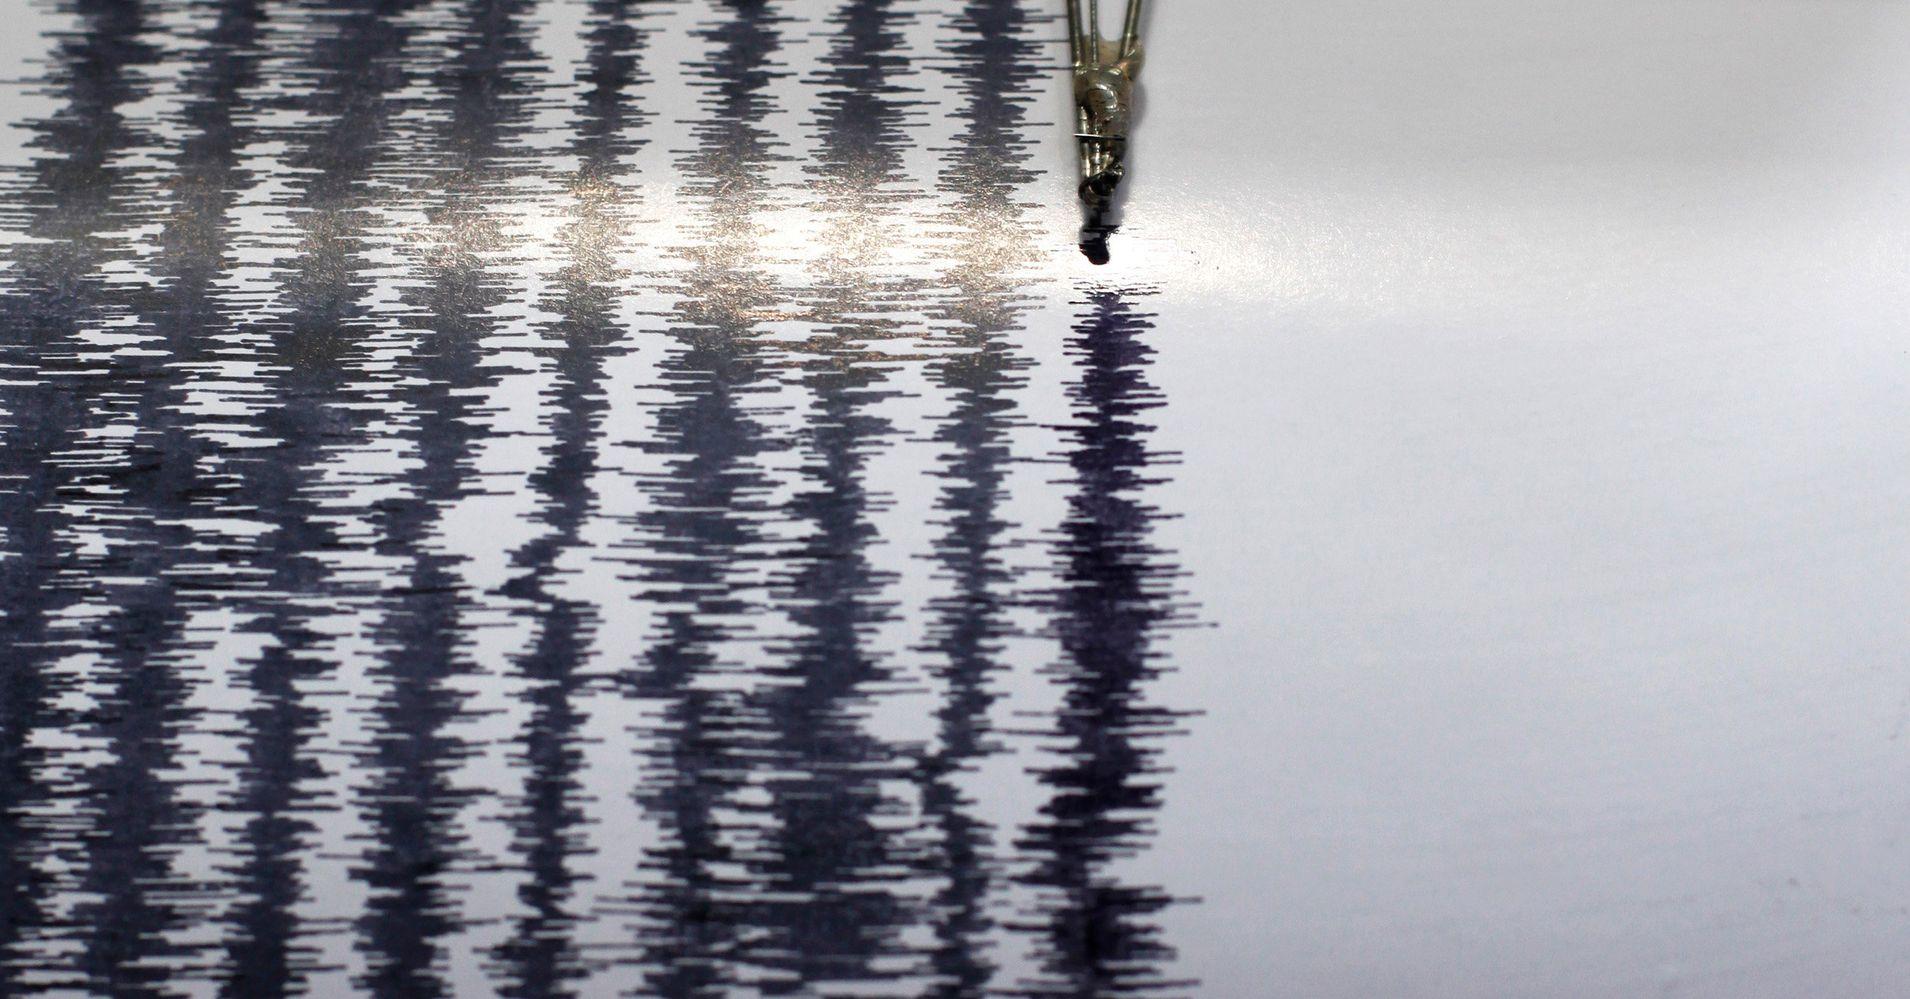 Magnitude 6.7 Quake Hits Off Turkey's Coast